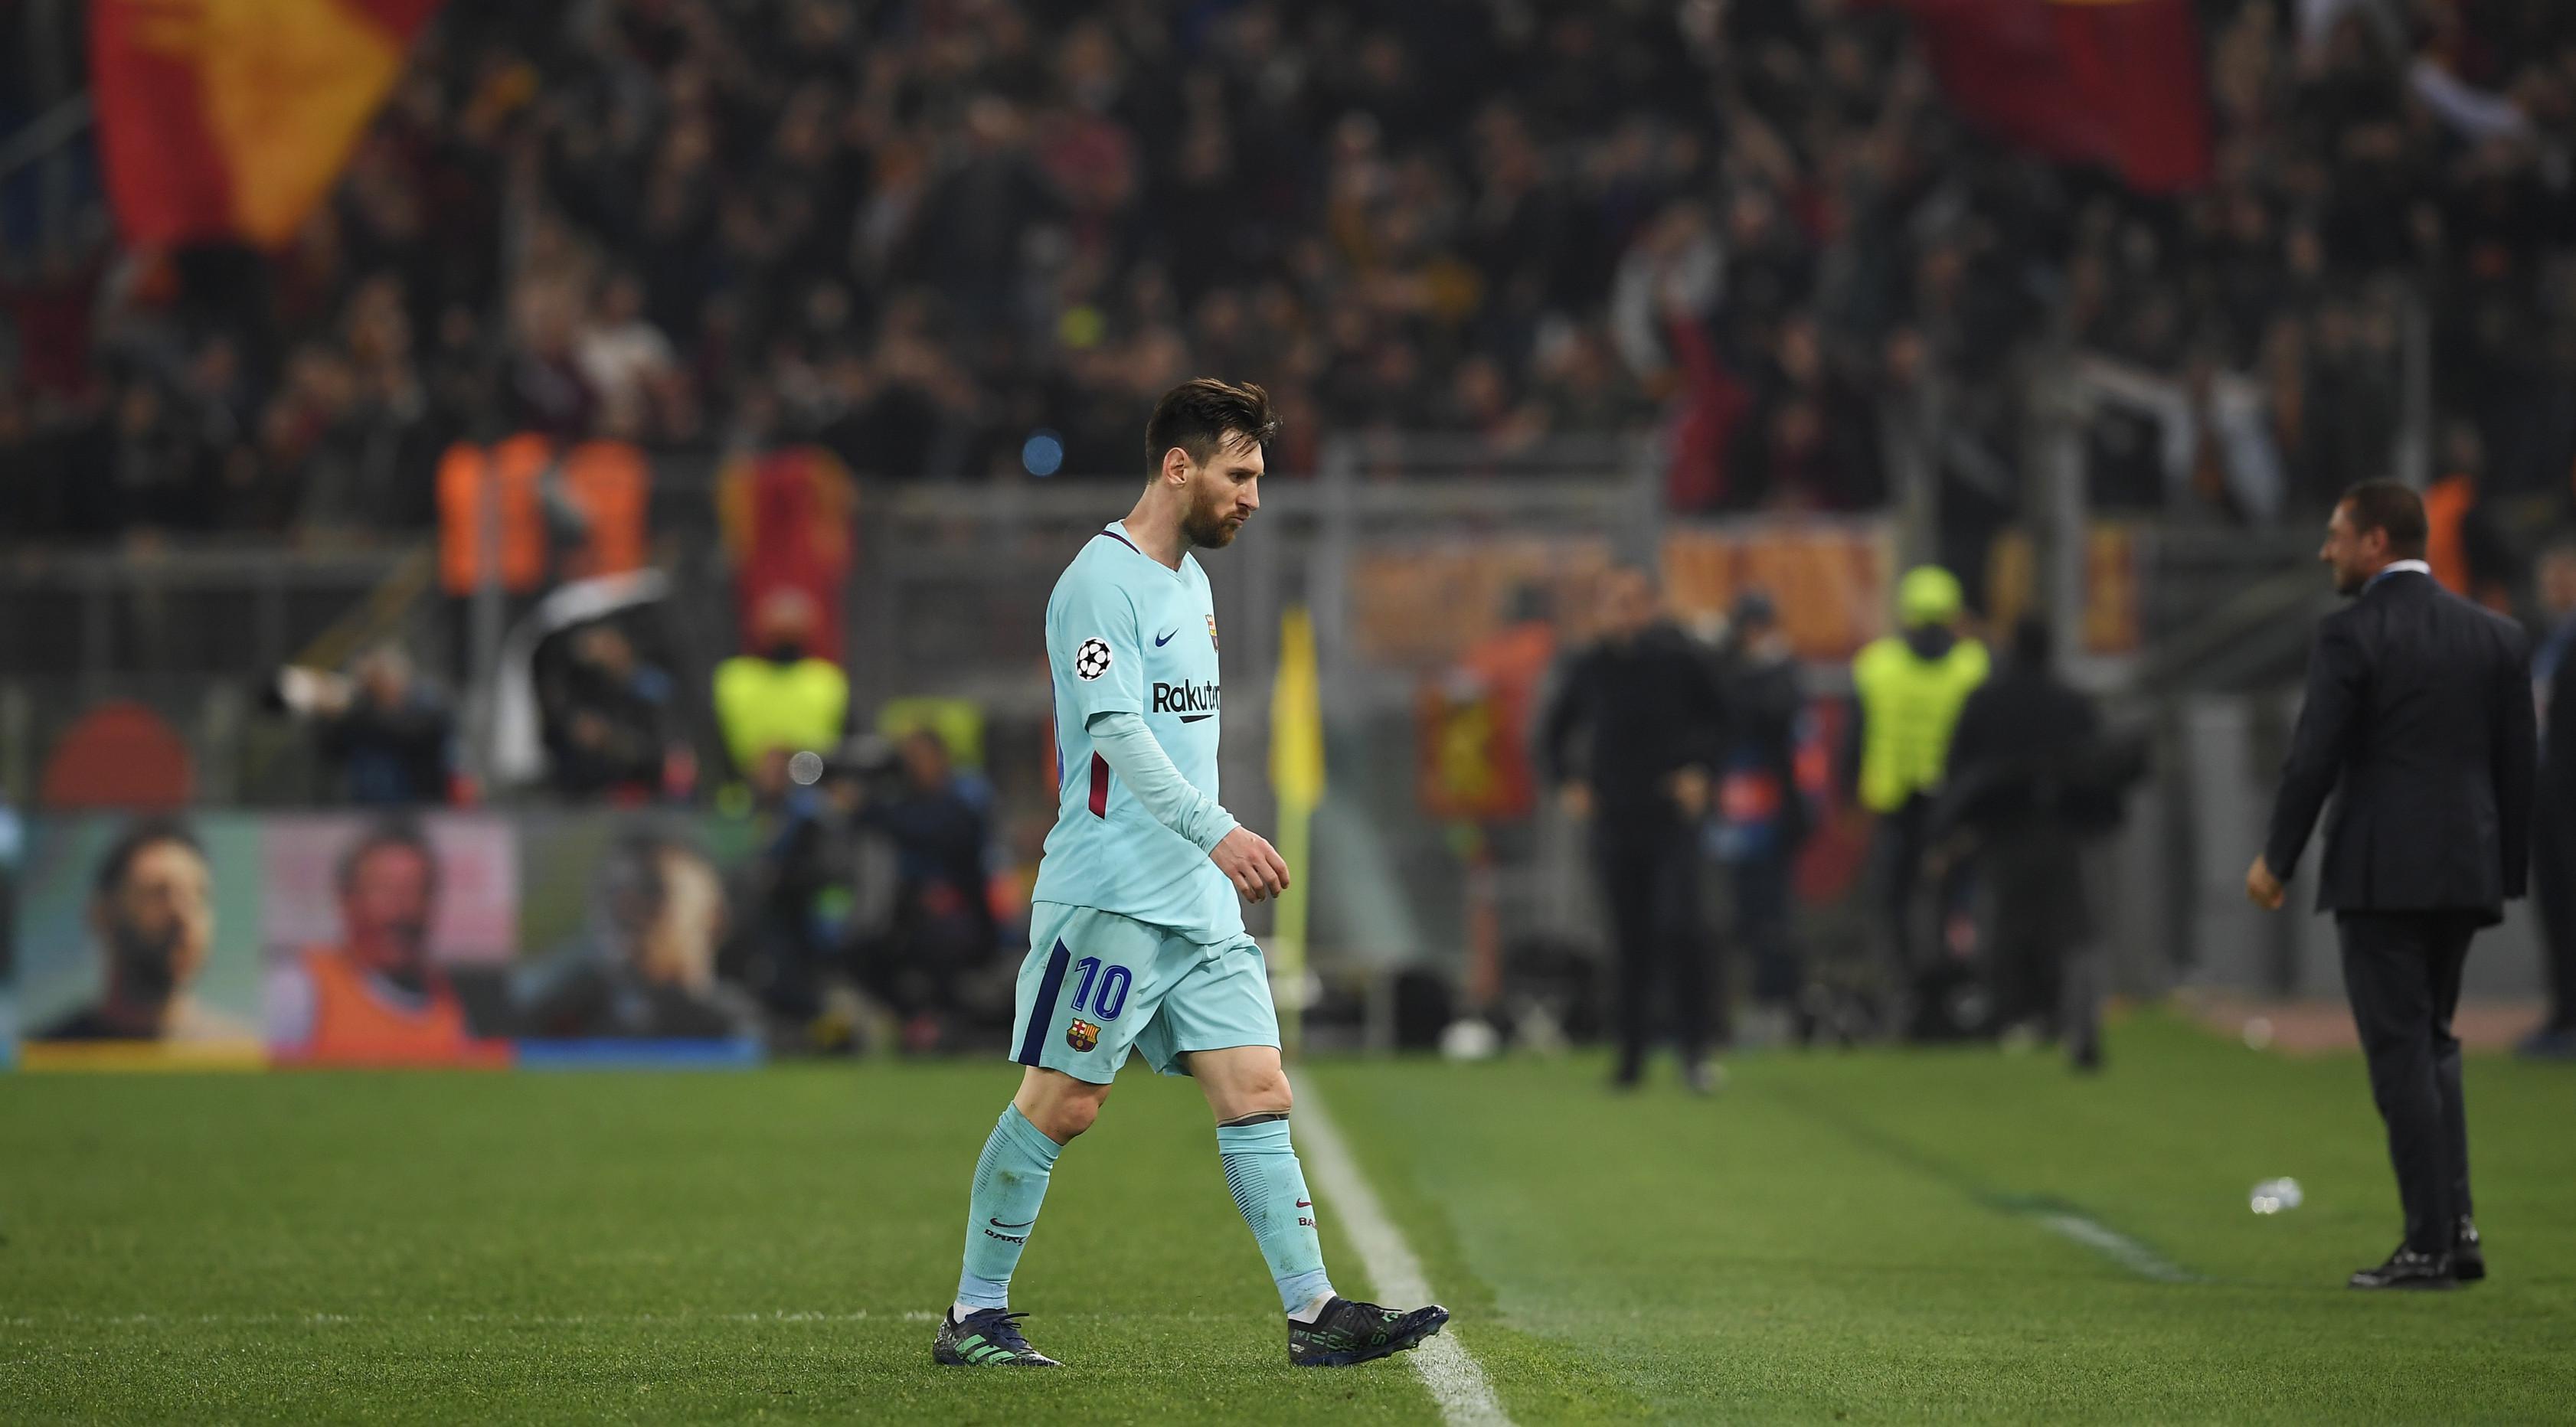 Pemain Barcelona, Lionel Messi tertunduk meninggalkan lapangan usai kalah dari AS Roma pada laga leg kedua perempat final Liga Champions di Stadion Olimpico, Selasa (10/4). Bercelona tersingkir setelah menyerah 0-3 dari AS Roma. (Andreas SOLARO/AFP)